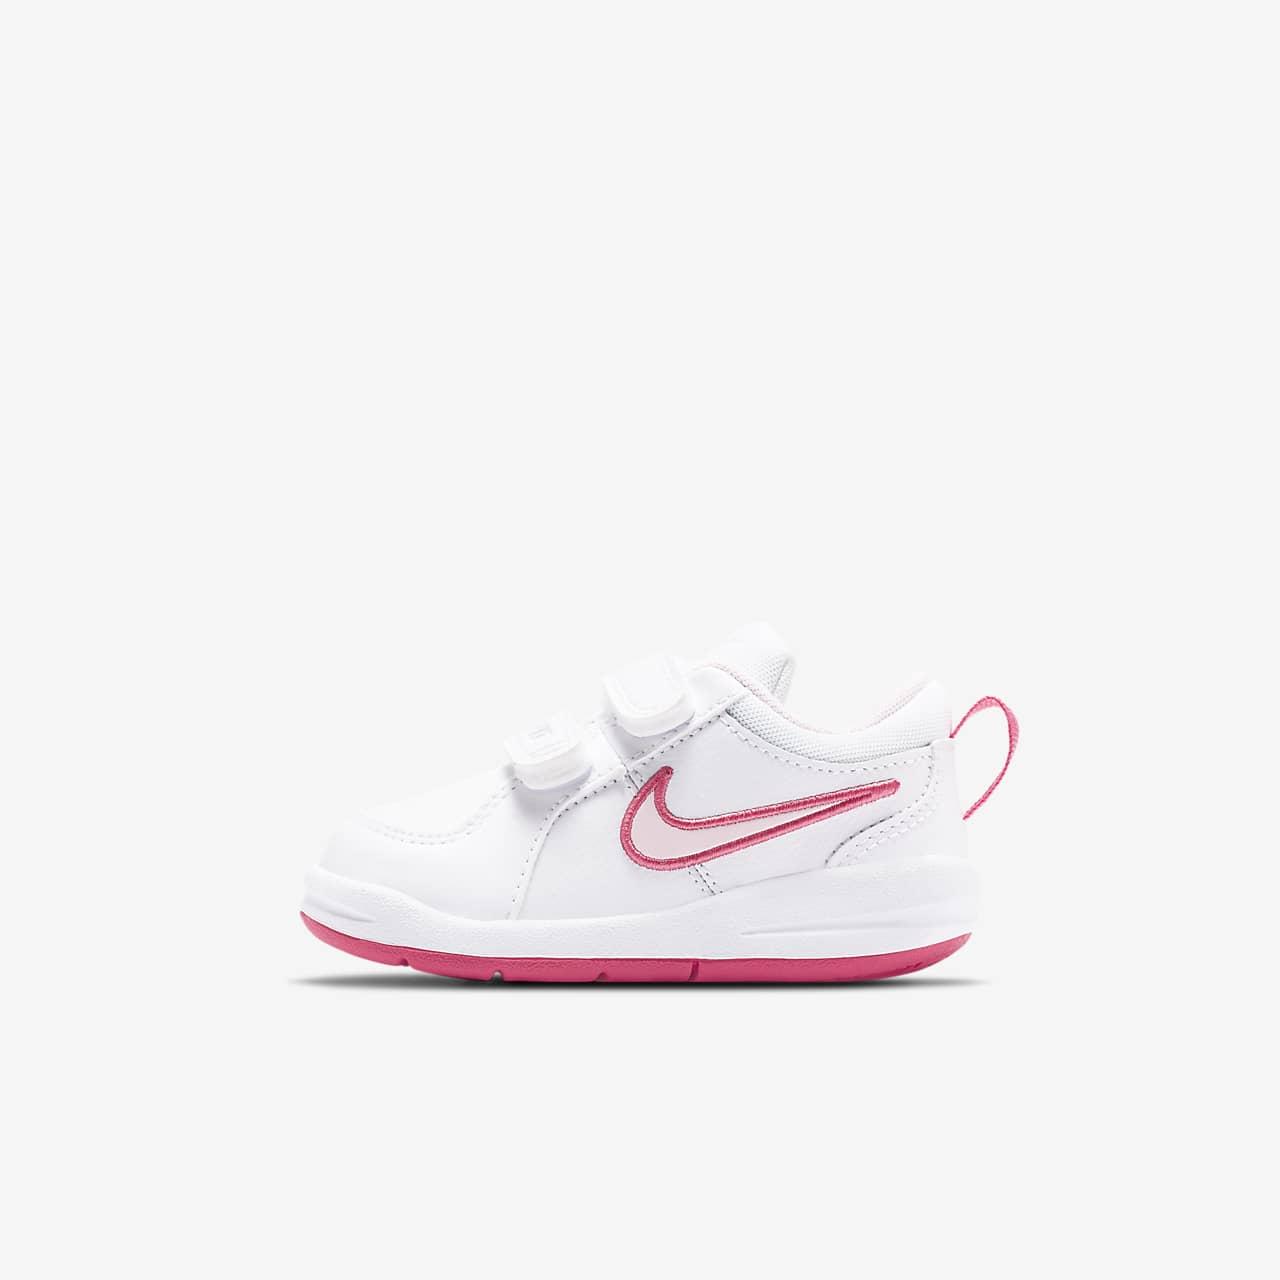 Nike Pico 4 baba/tipegő lánycipő